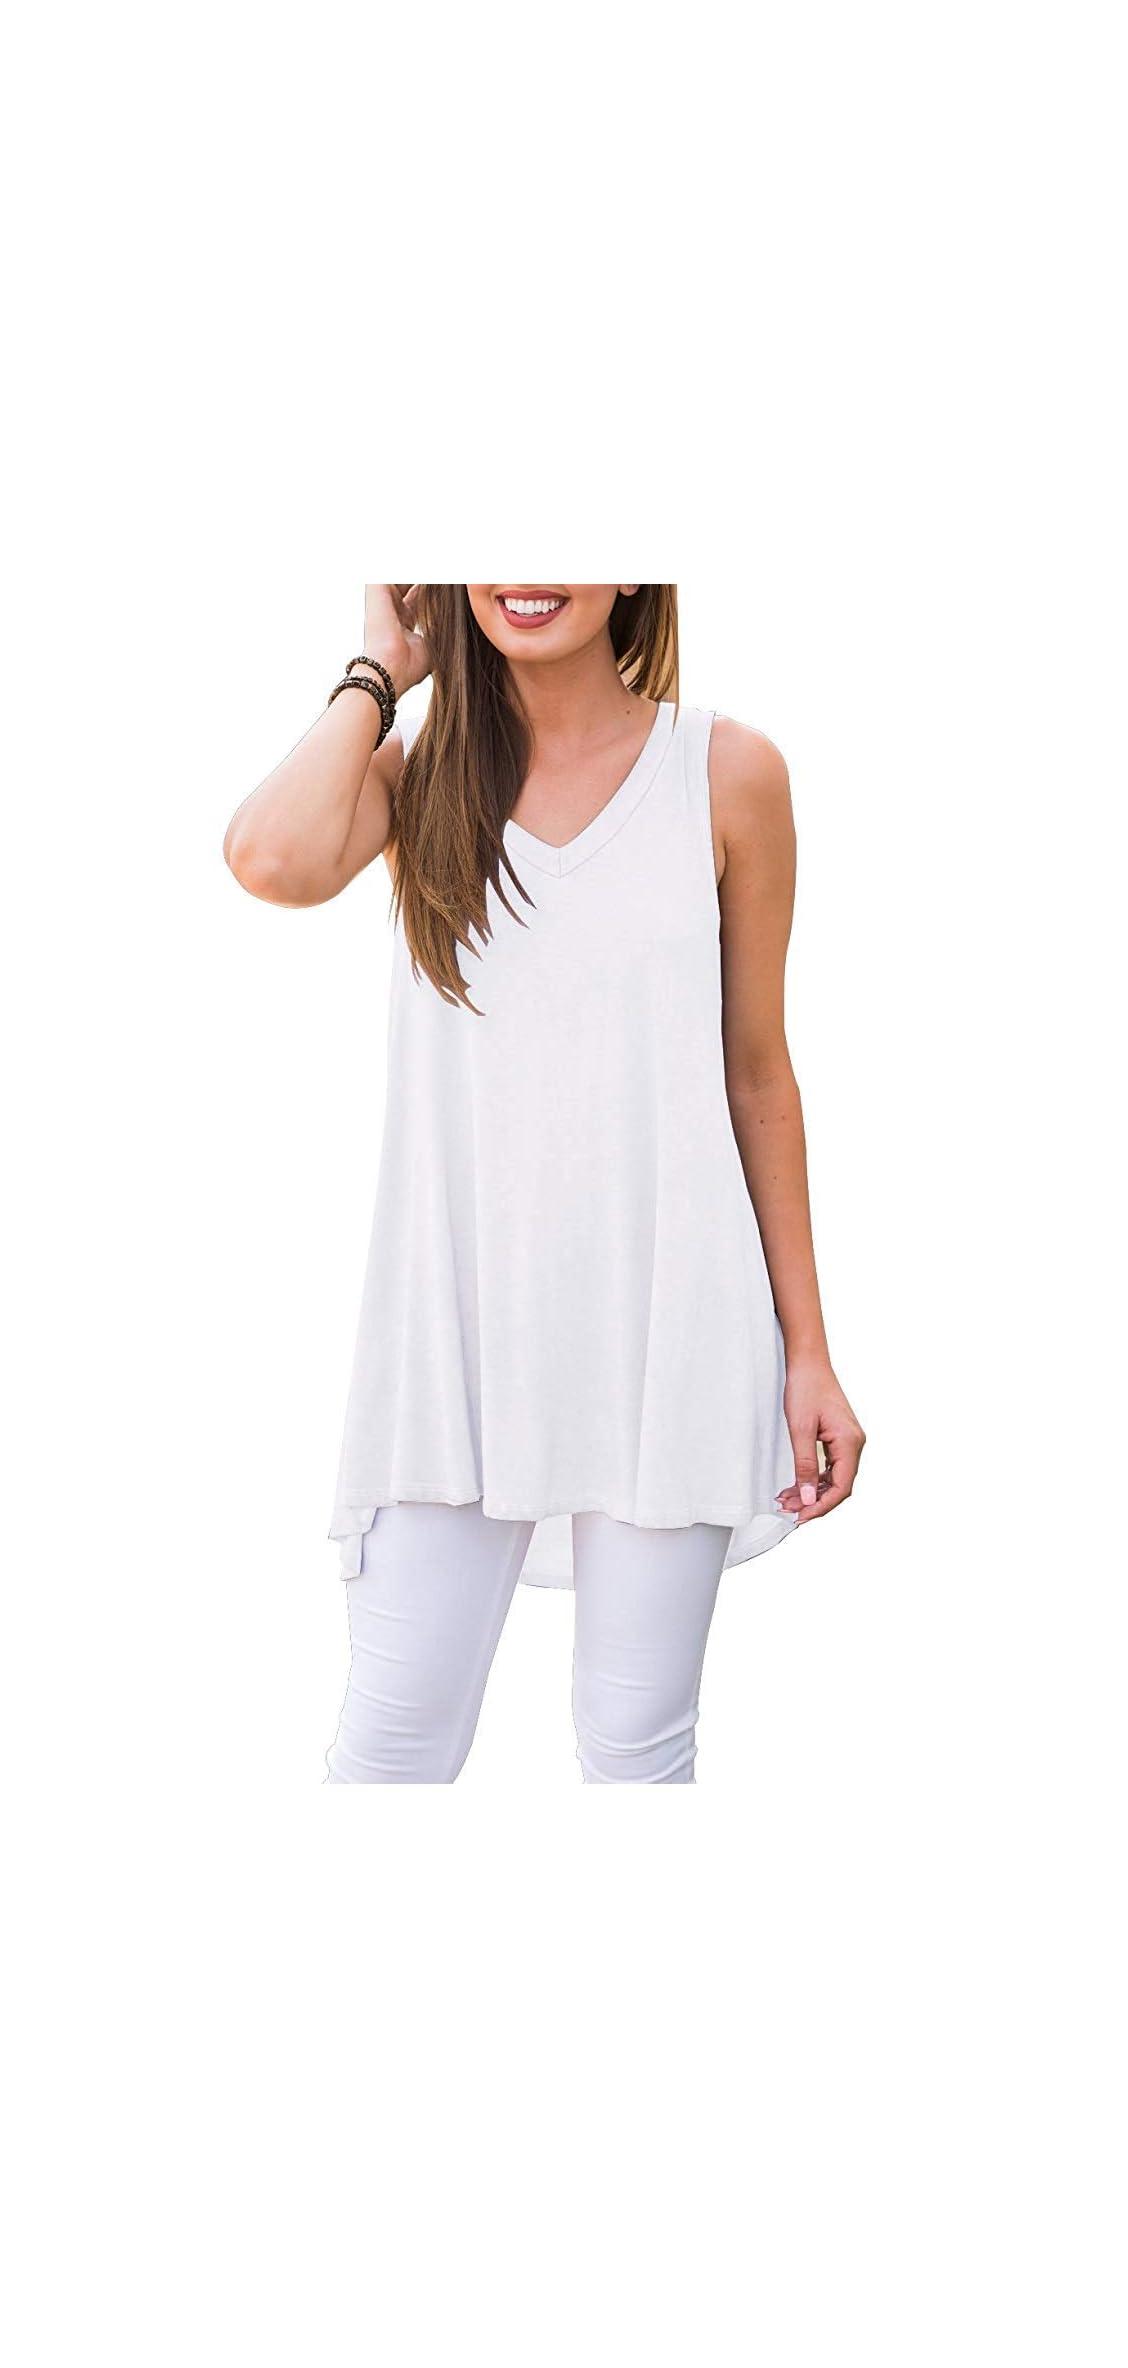 Women Summer Sleeveless V-neck Hi-low T-shirt Tunic Top